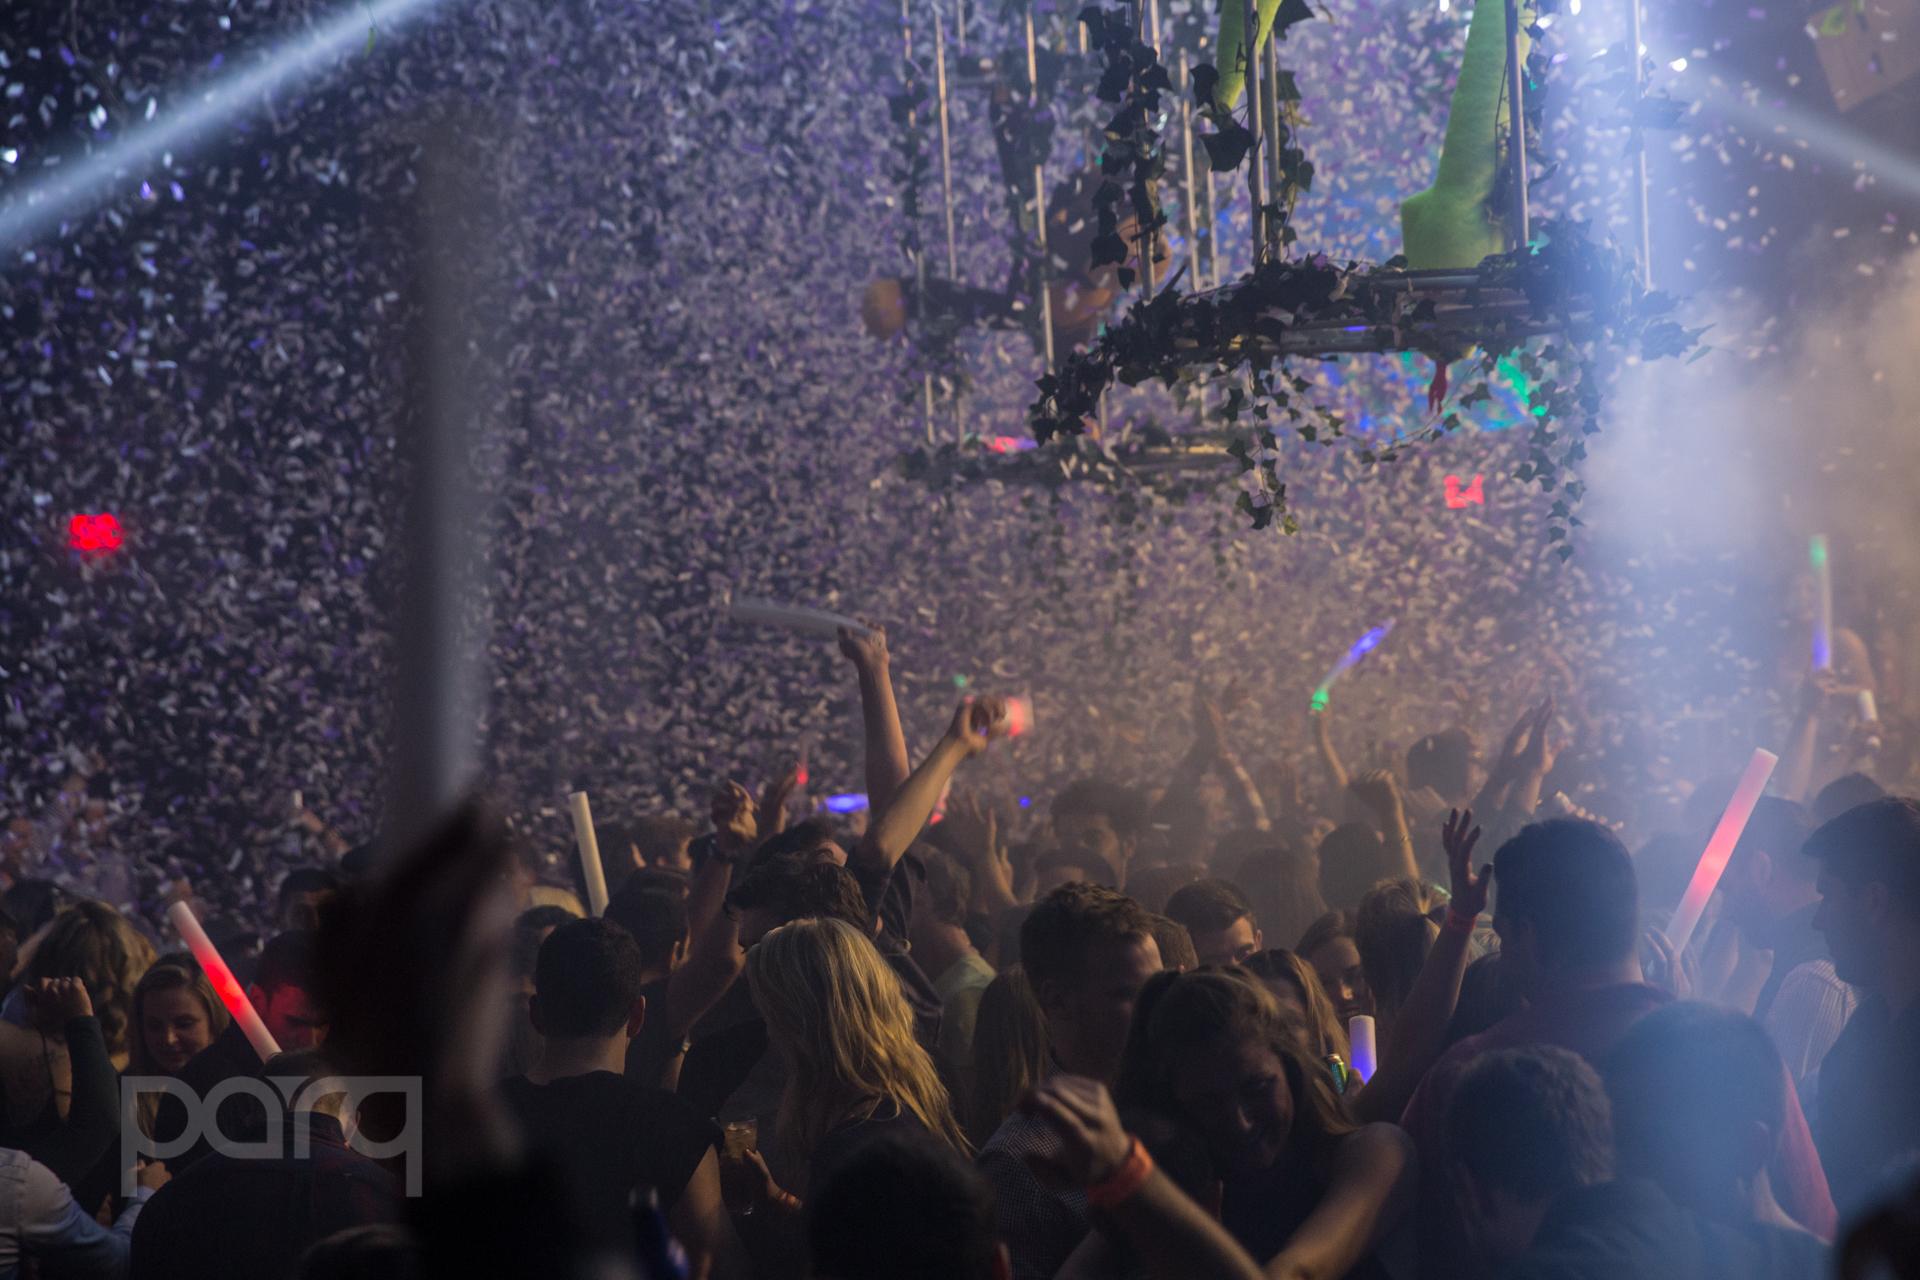 San-Diego-Nightclub-Zoo Funktion-48.jpg